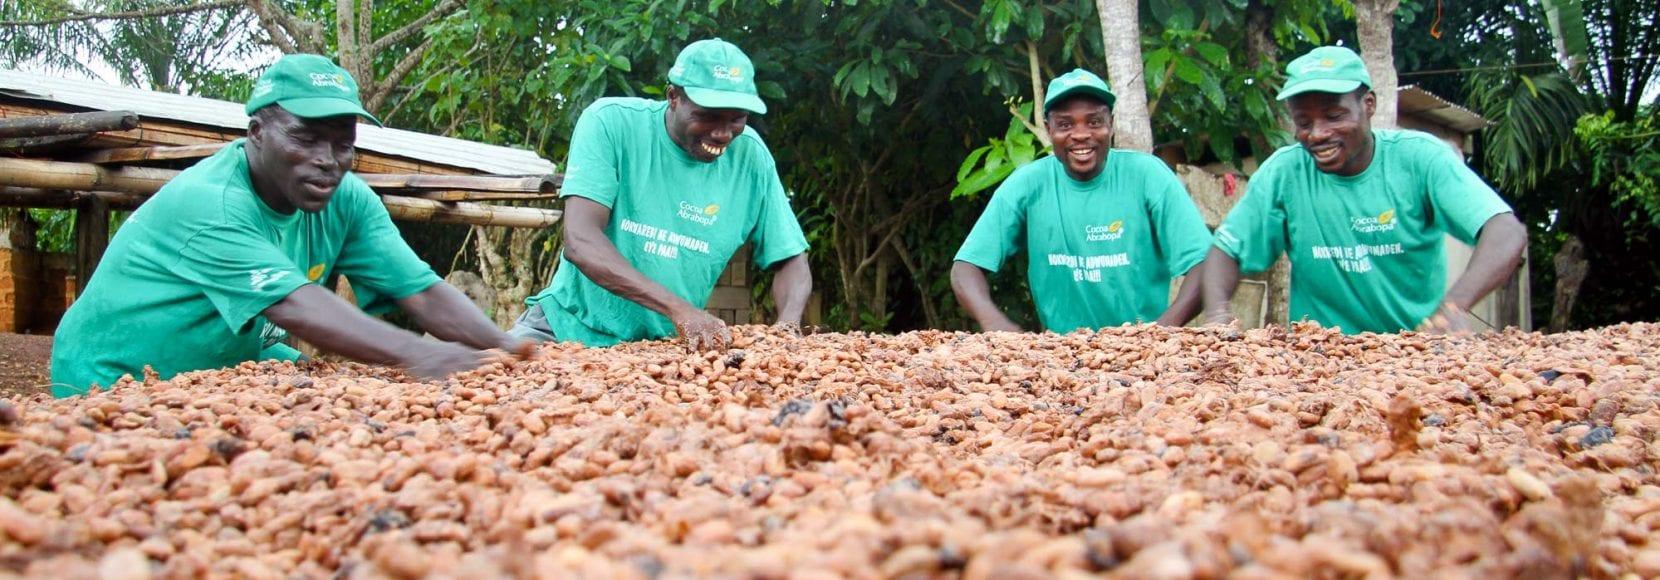 Ghana Subsistence Farming